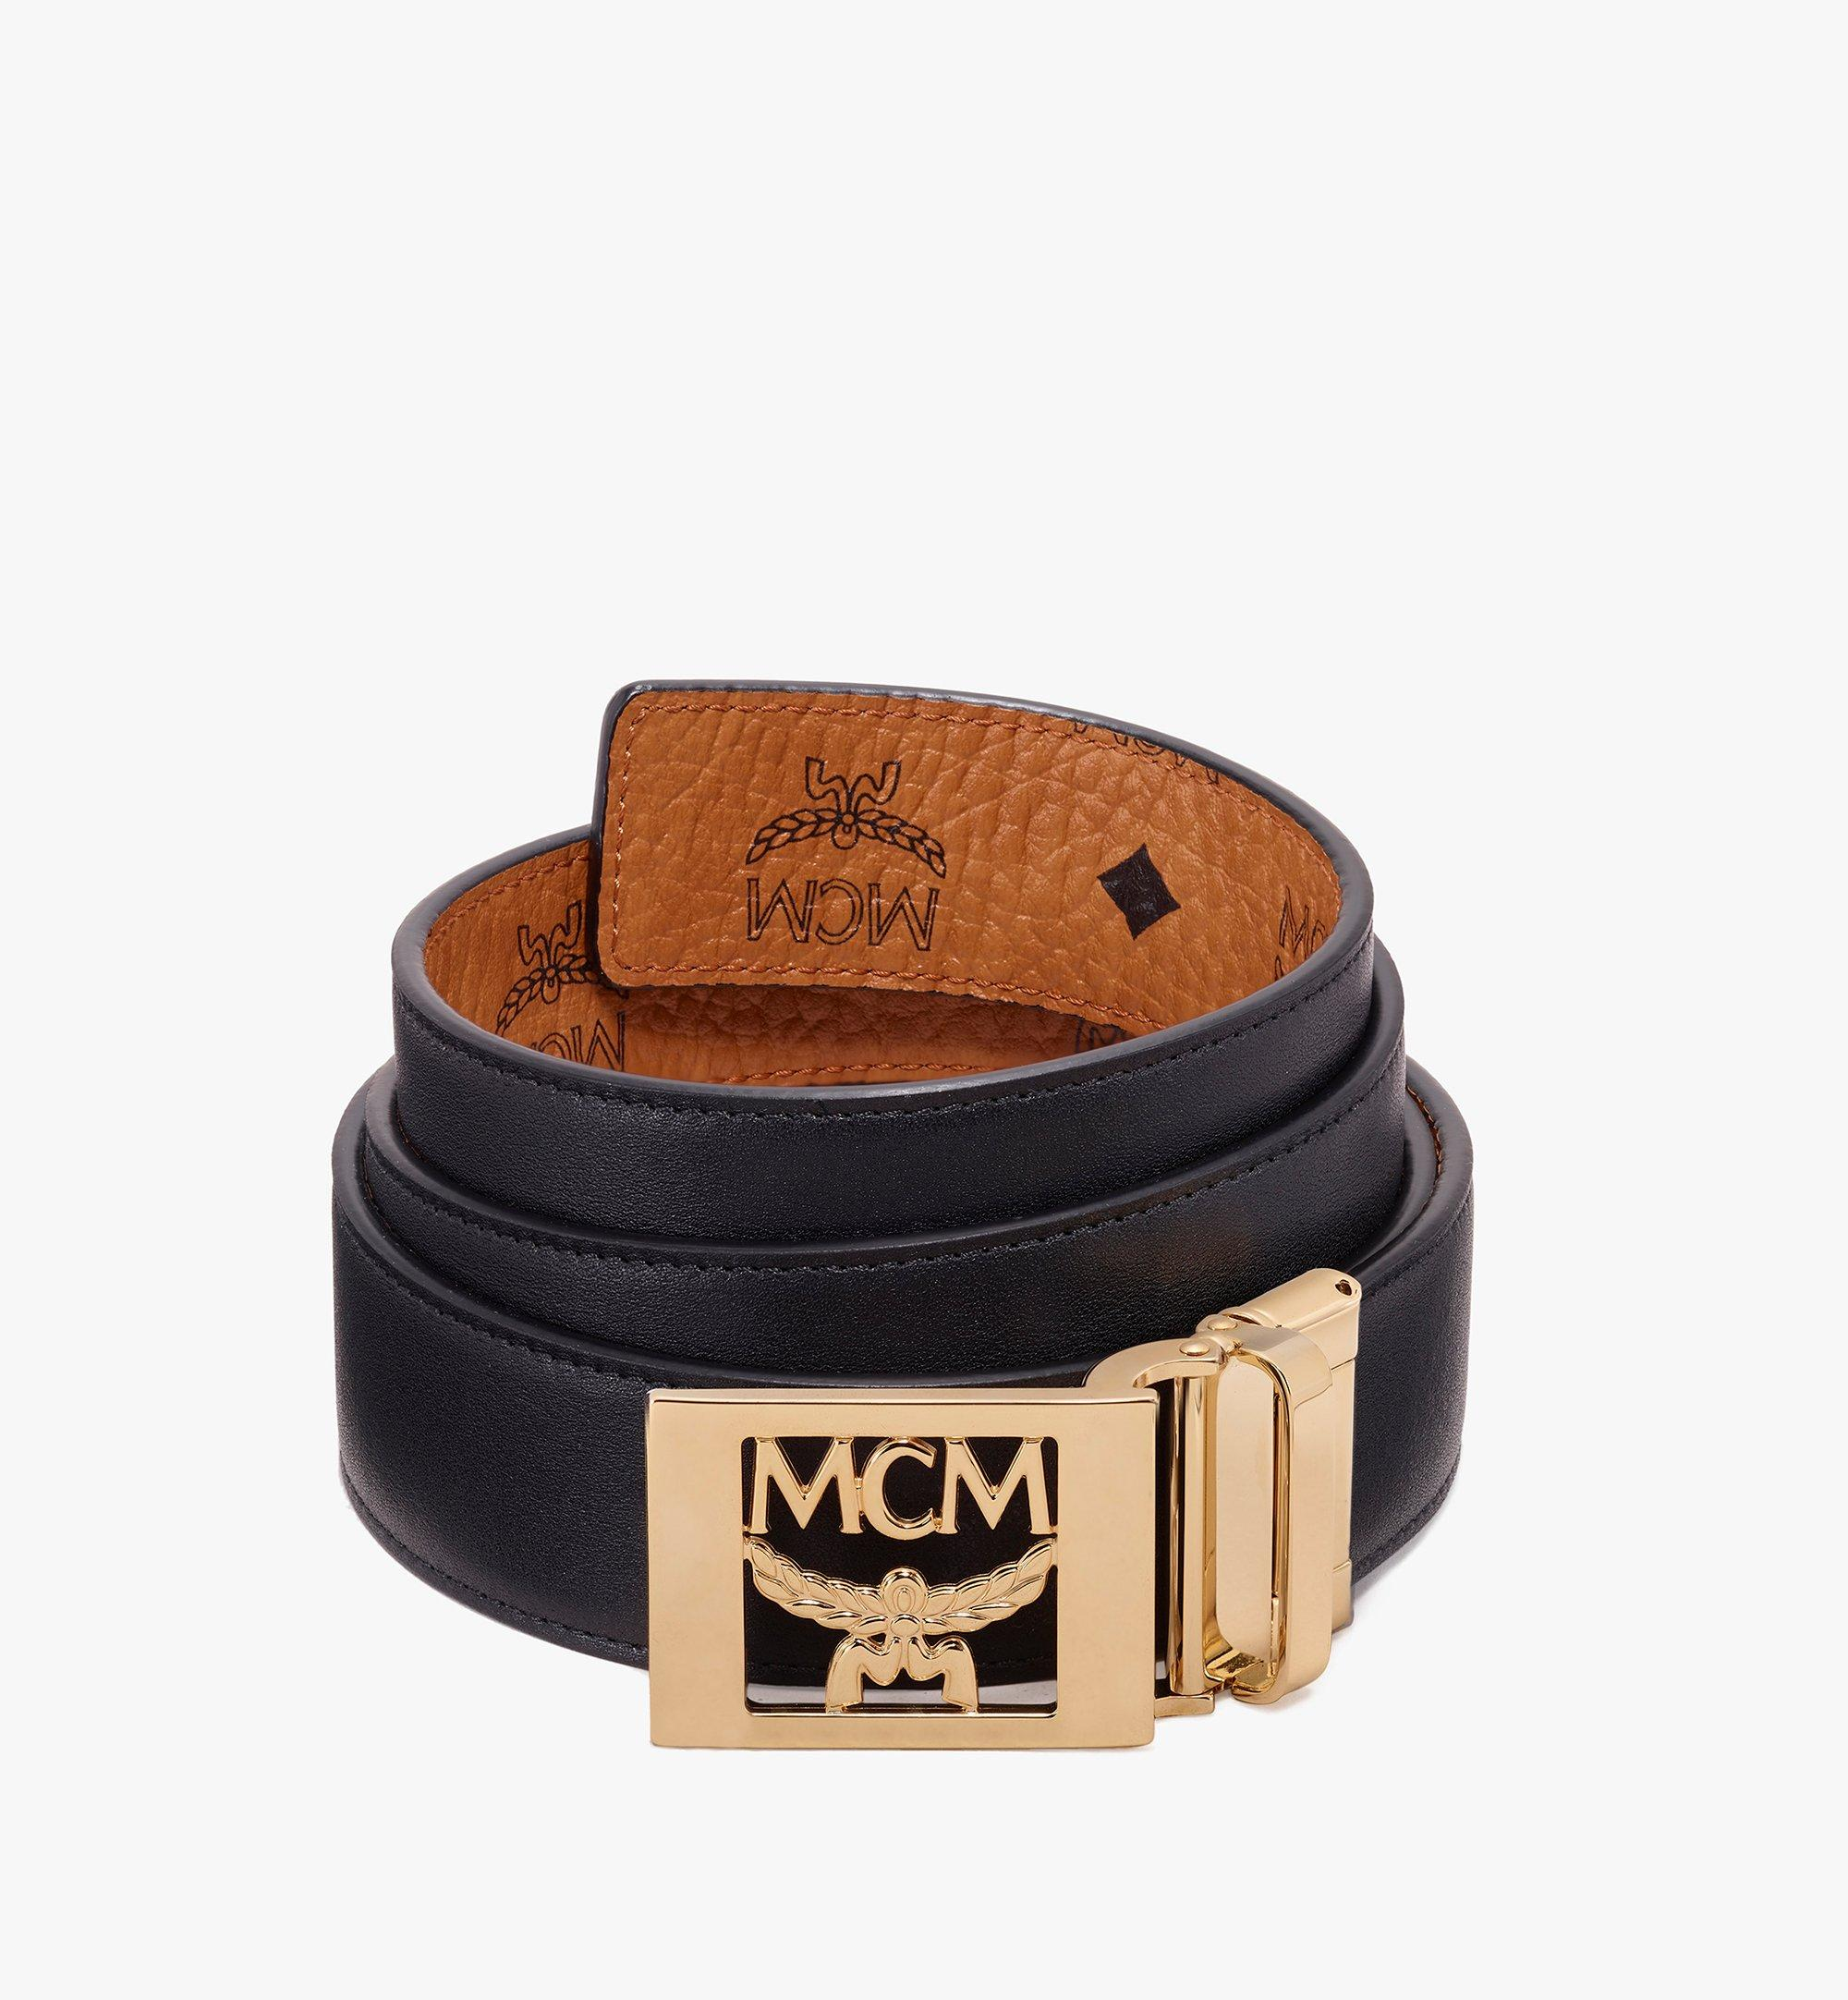 "MCM MCM Laurel Reversible Belt 1.5"" in Visetos Cognac MYB9AMM36CO001 Alternate View 2"